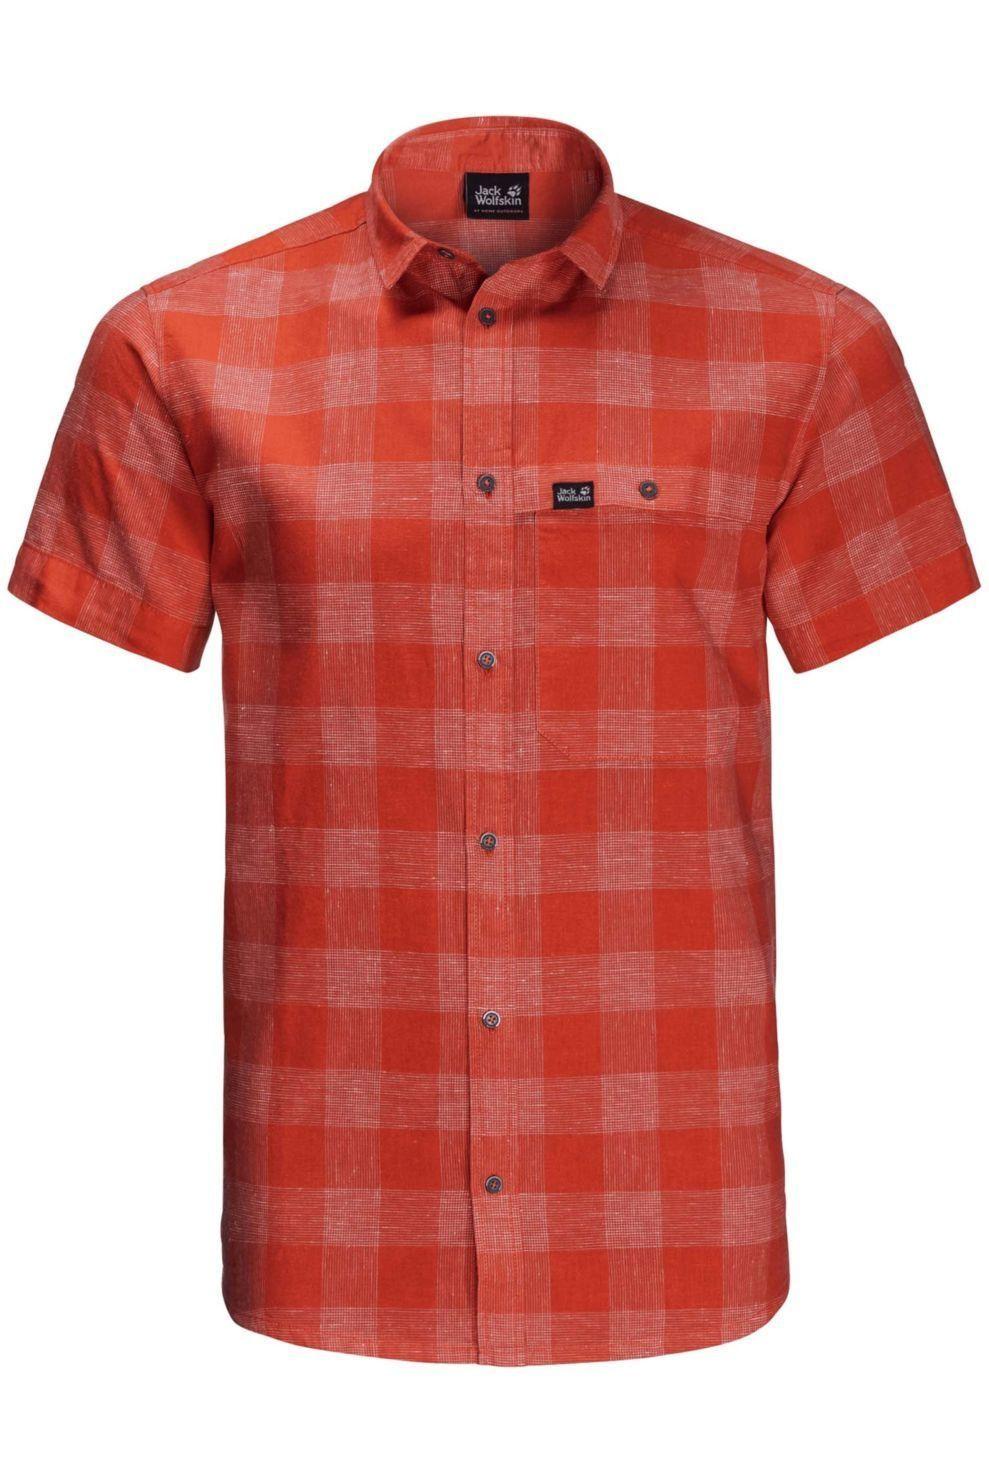 Jack Wolfskin Hemd Highlands M voor heren - Rood/Geschakeerd - Maten: S, M, L, XL, XXL, XXXL